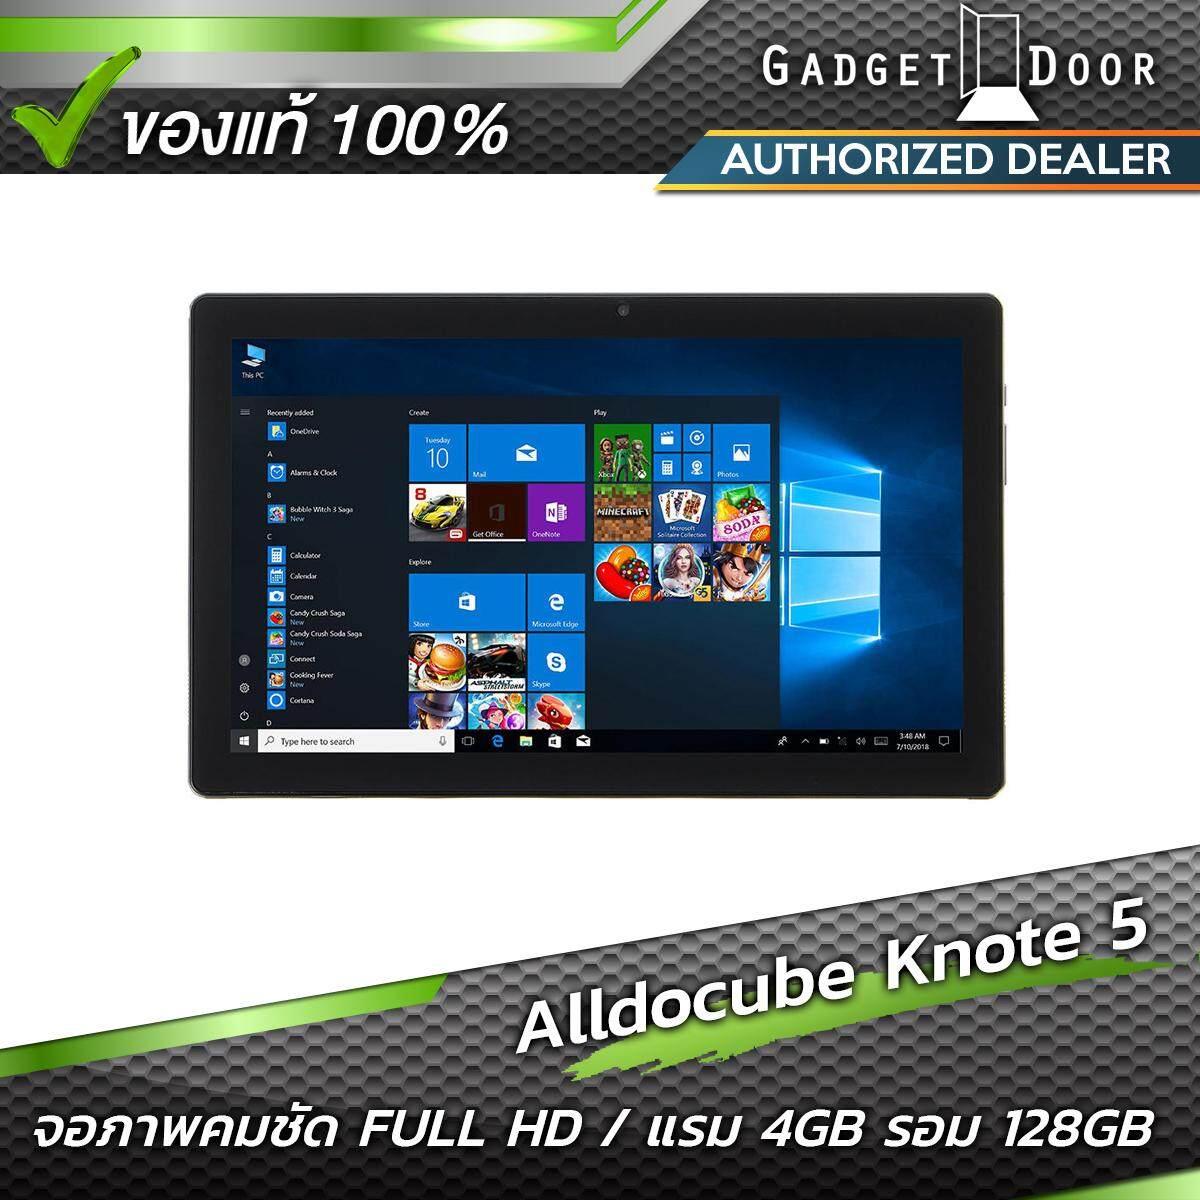 Alldocube Knote 5 2 In 1 Tablet 11.6 Intel Gemini Lake N4000 Windows 10 Home 4gb/128gb (silver).